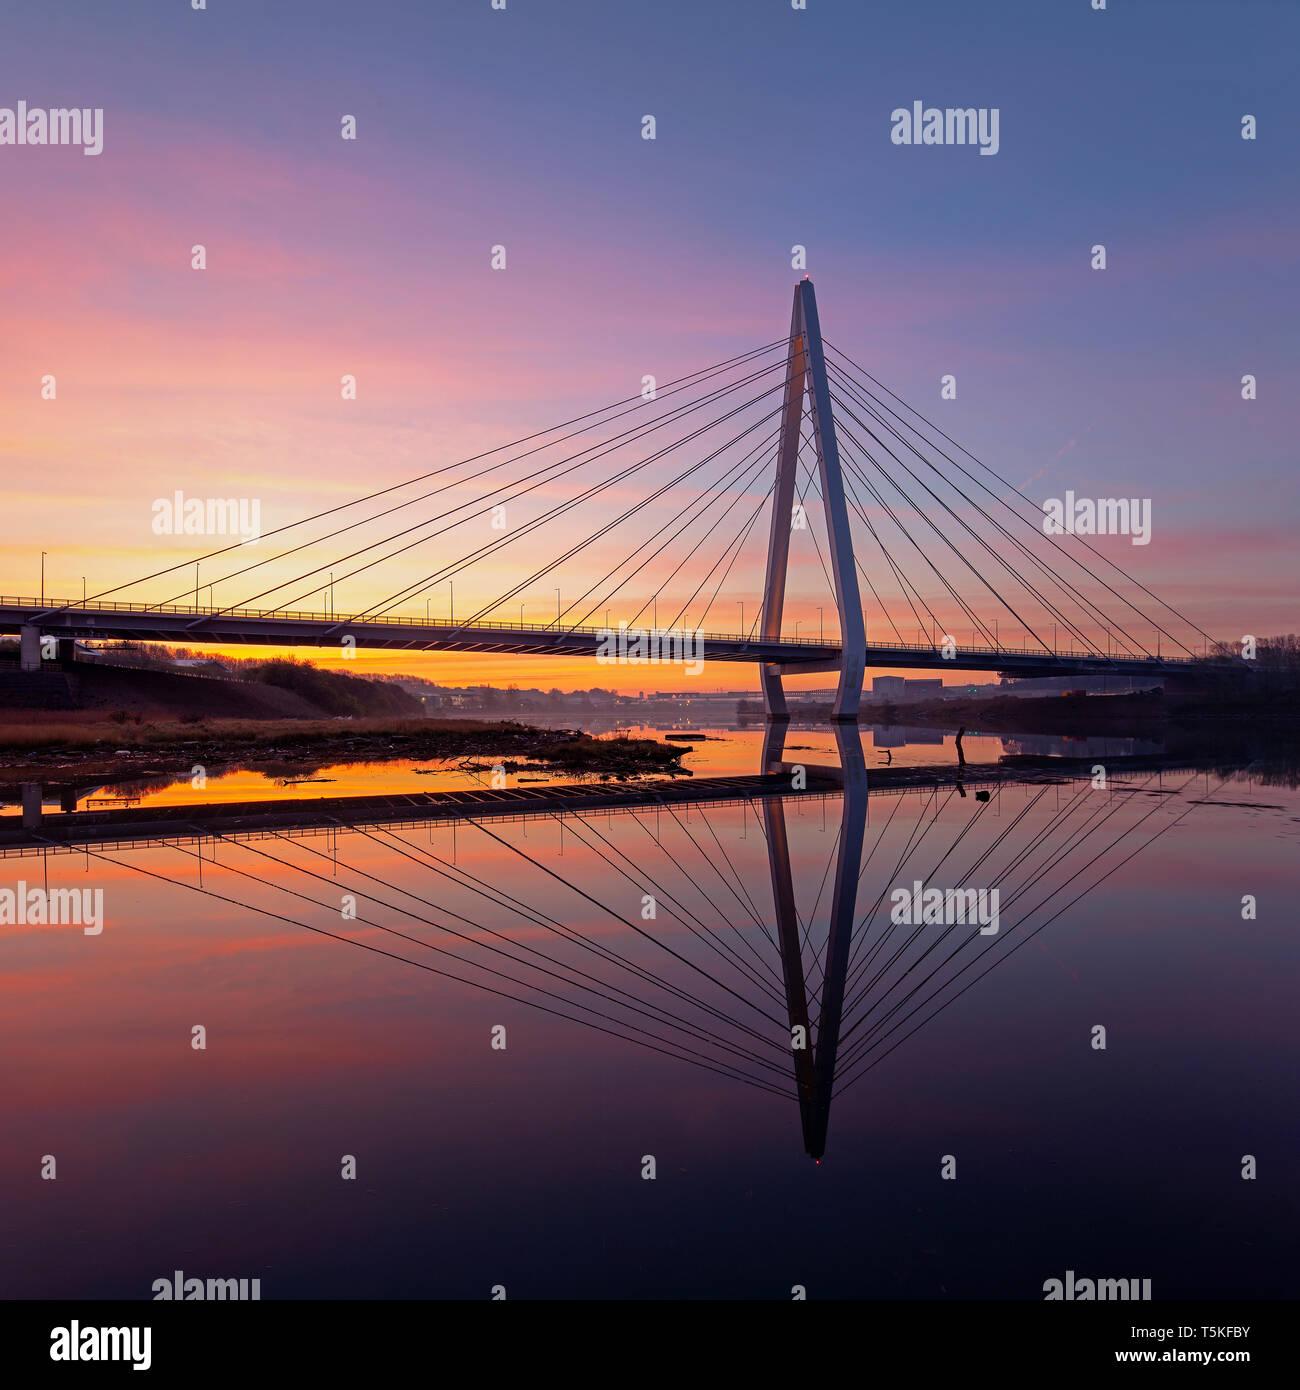 Northern Spire bridge at sunrise, Sunderland, Tyne & Wear, England, United Kingdom - Stock Image